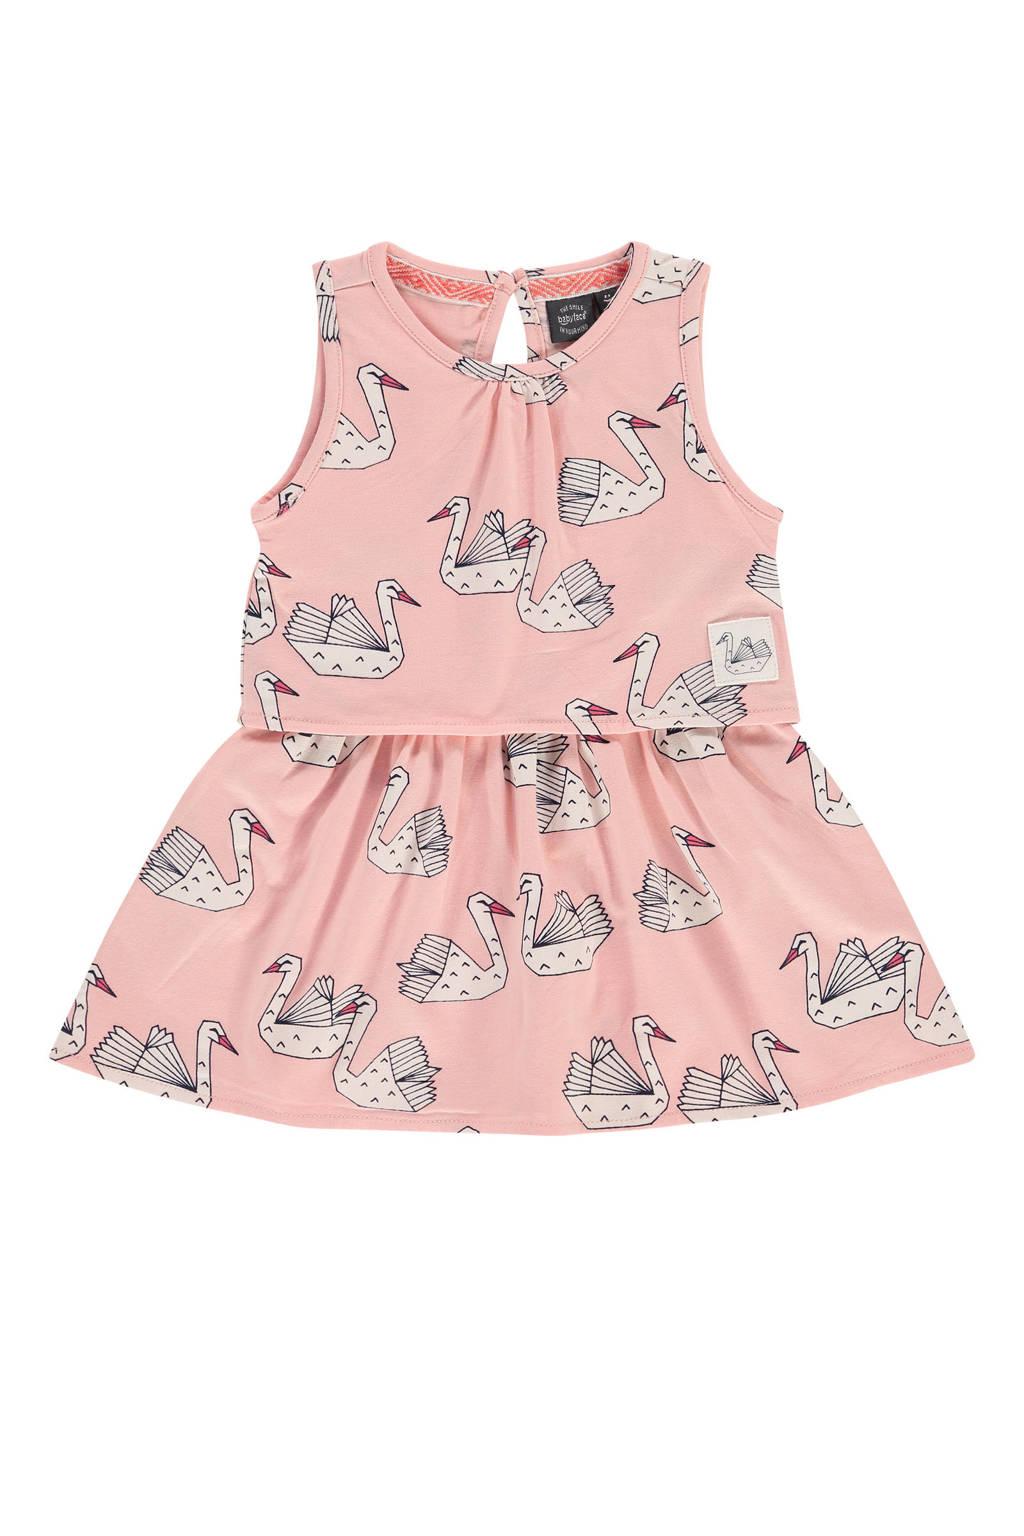 Babyface jurk met dierenprint en plooien lichtroze/zwart/wit, Lichtroze/zwart/wit